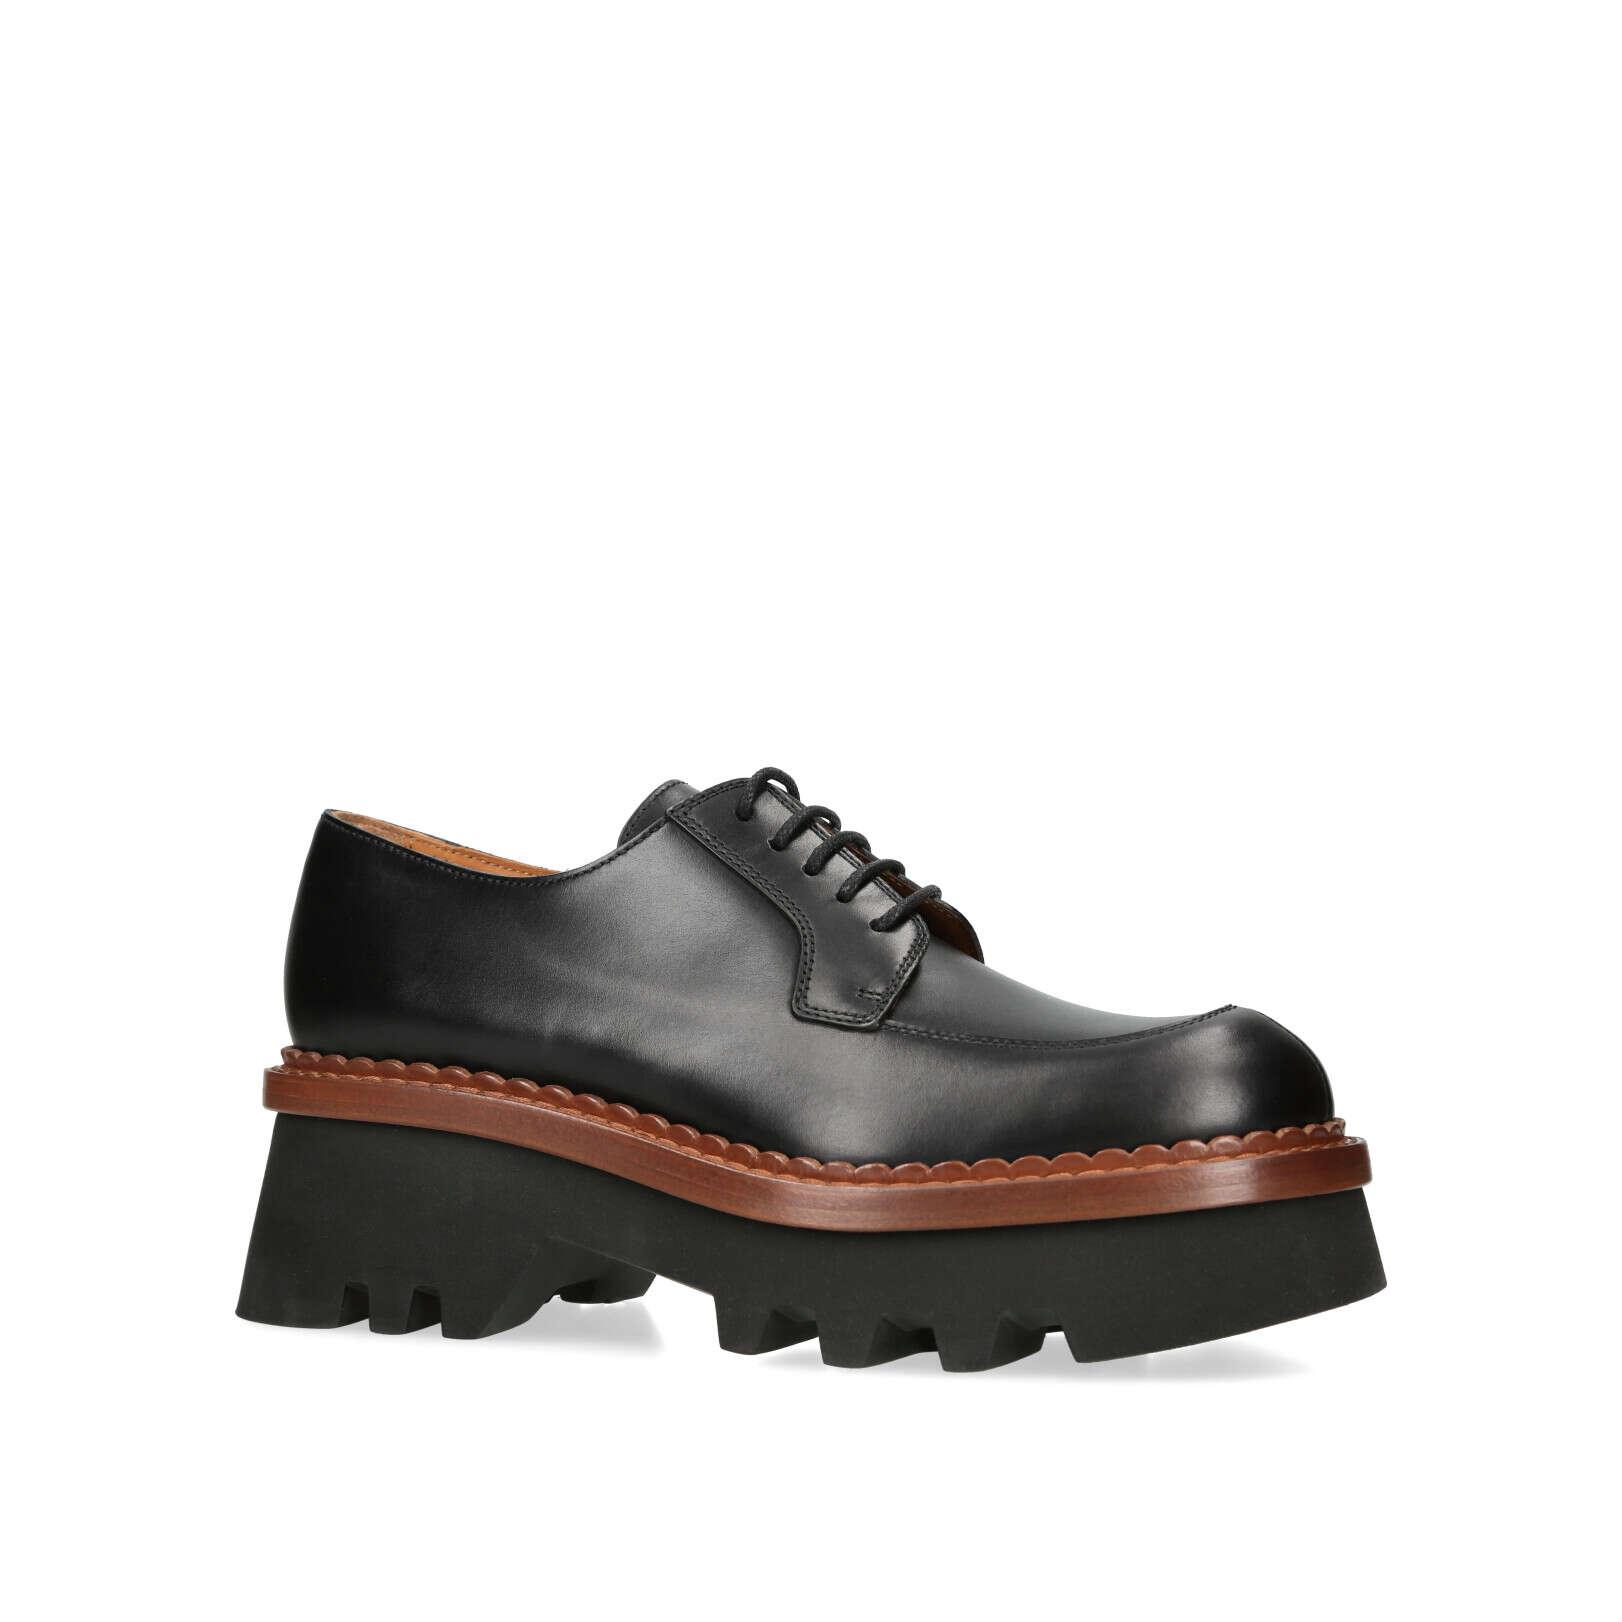 e850b6b76b7 THEA WEDGE Michael Michael Kors Thea Wedge Black Leather Ankle Boots by MICHAEL  MICHAEL KORS